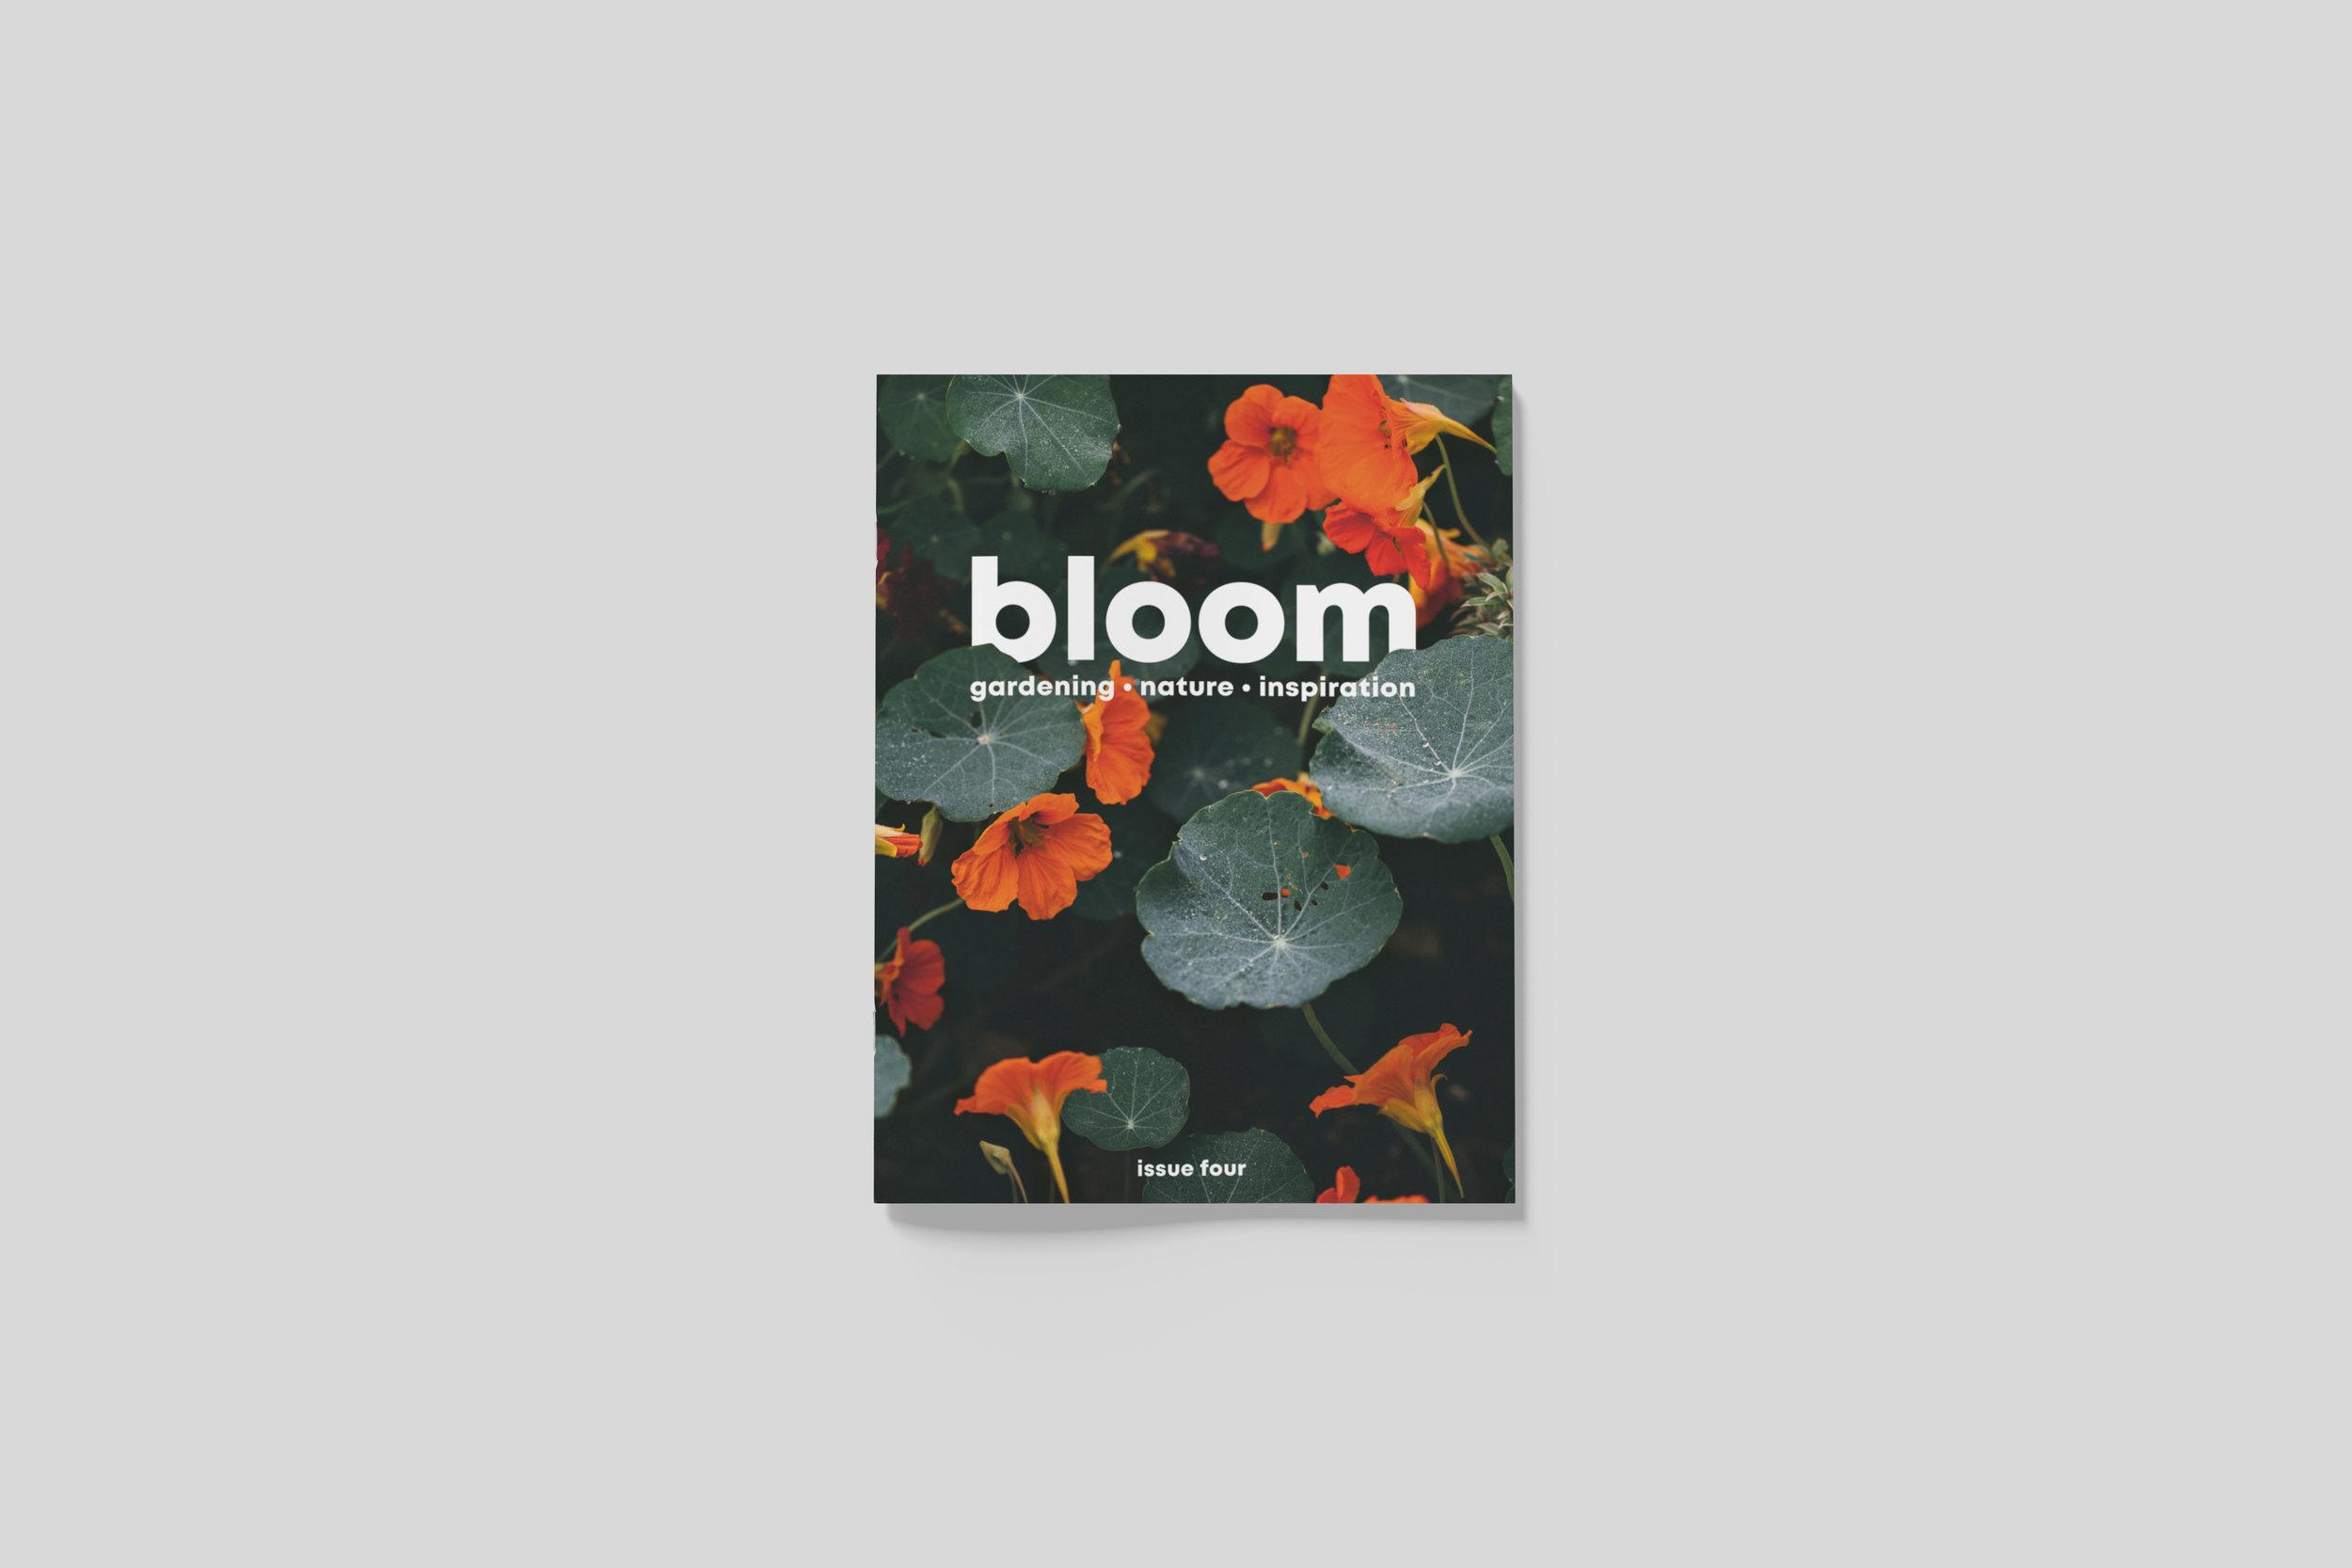 BloomIssue4_front_01.jpg